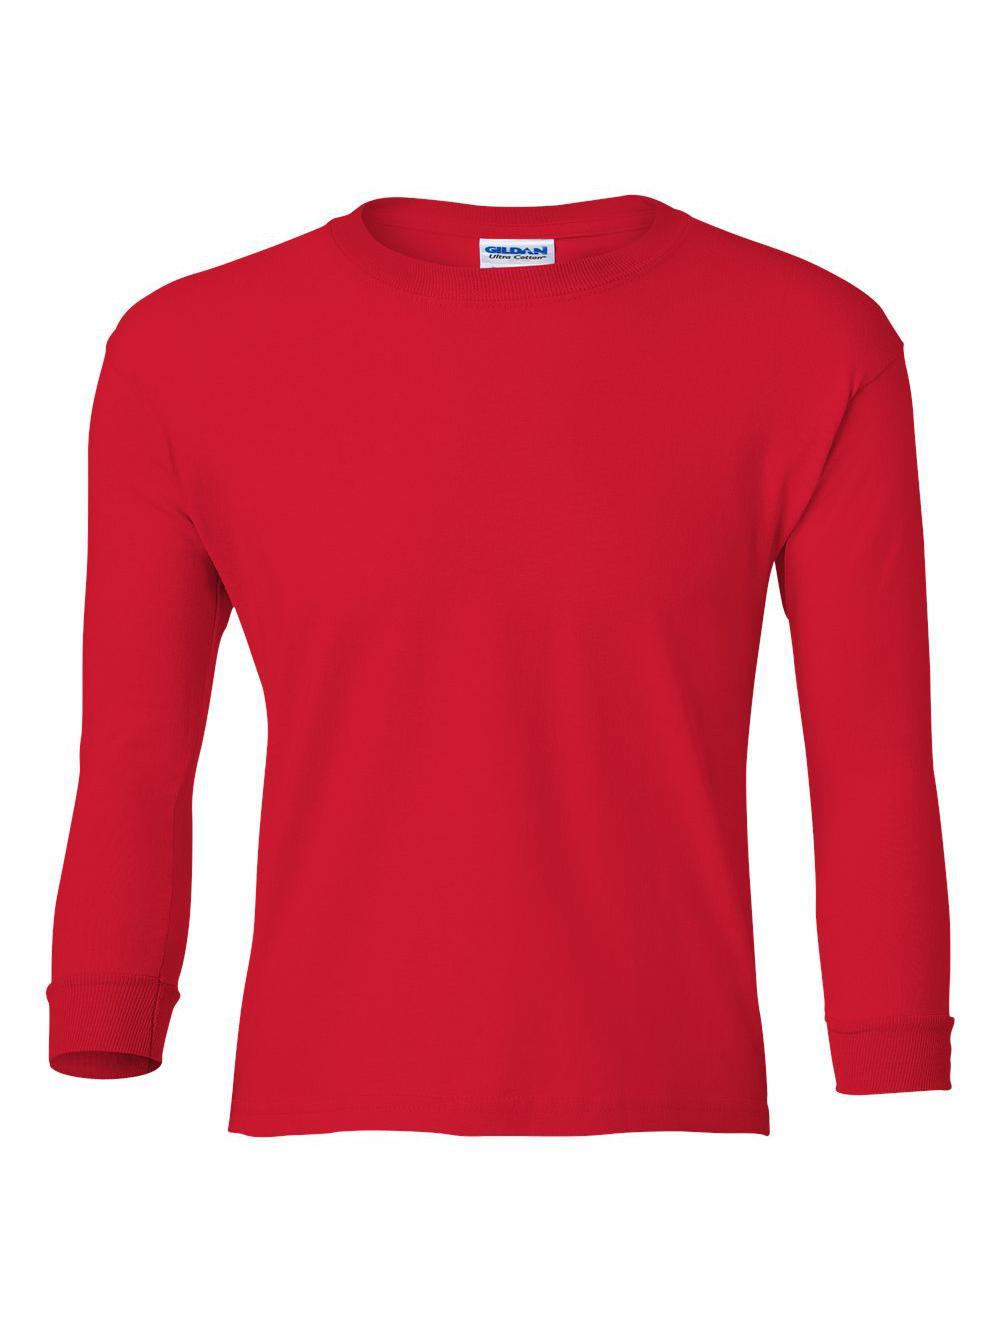 Gildan-Ultra-Cotton-Youth-Long-Sleeve-T-Shirt-2400B thumbnail 33